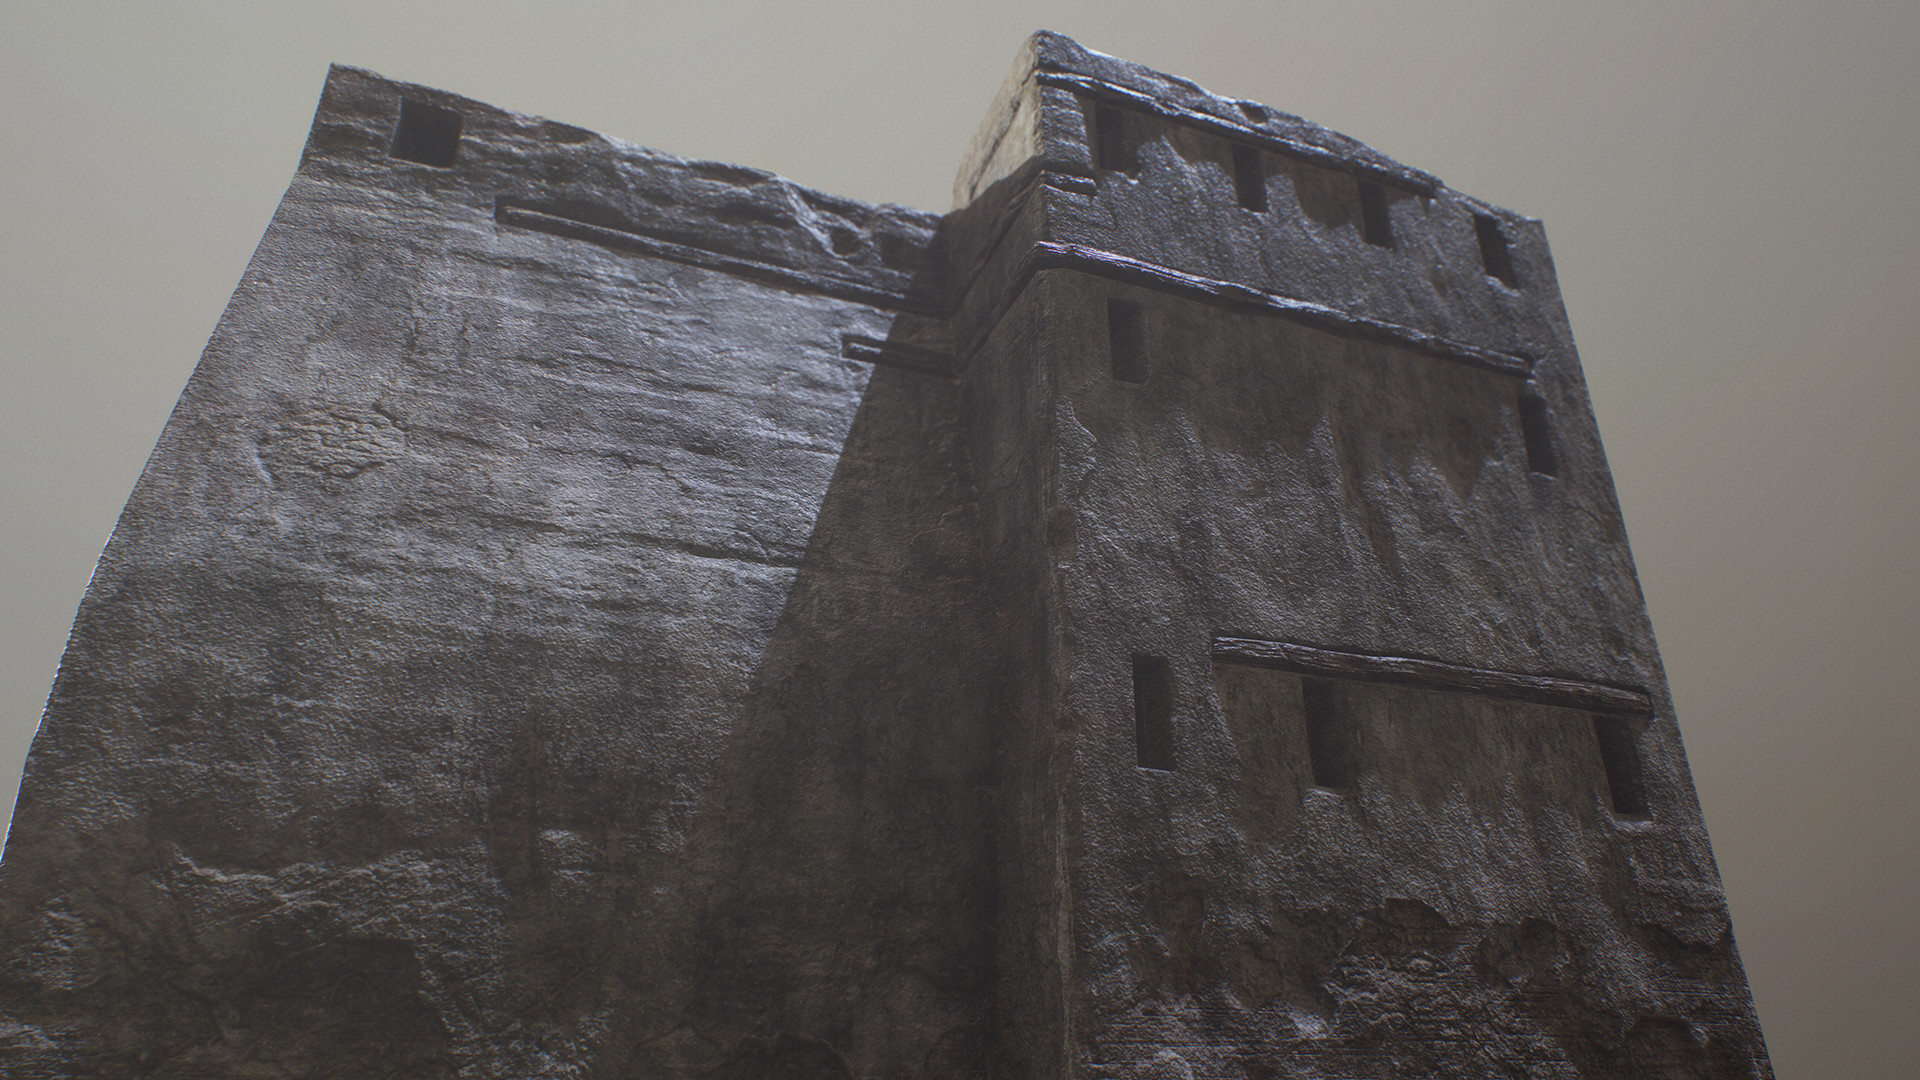 Walid k perrussel buildingl 2